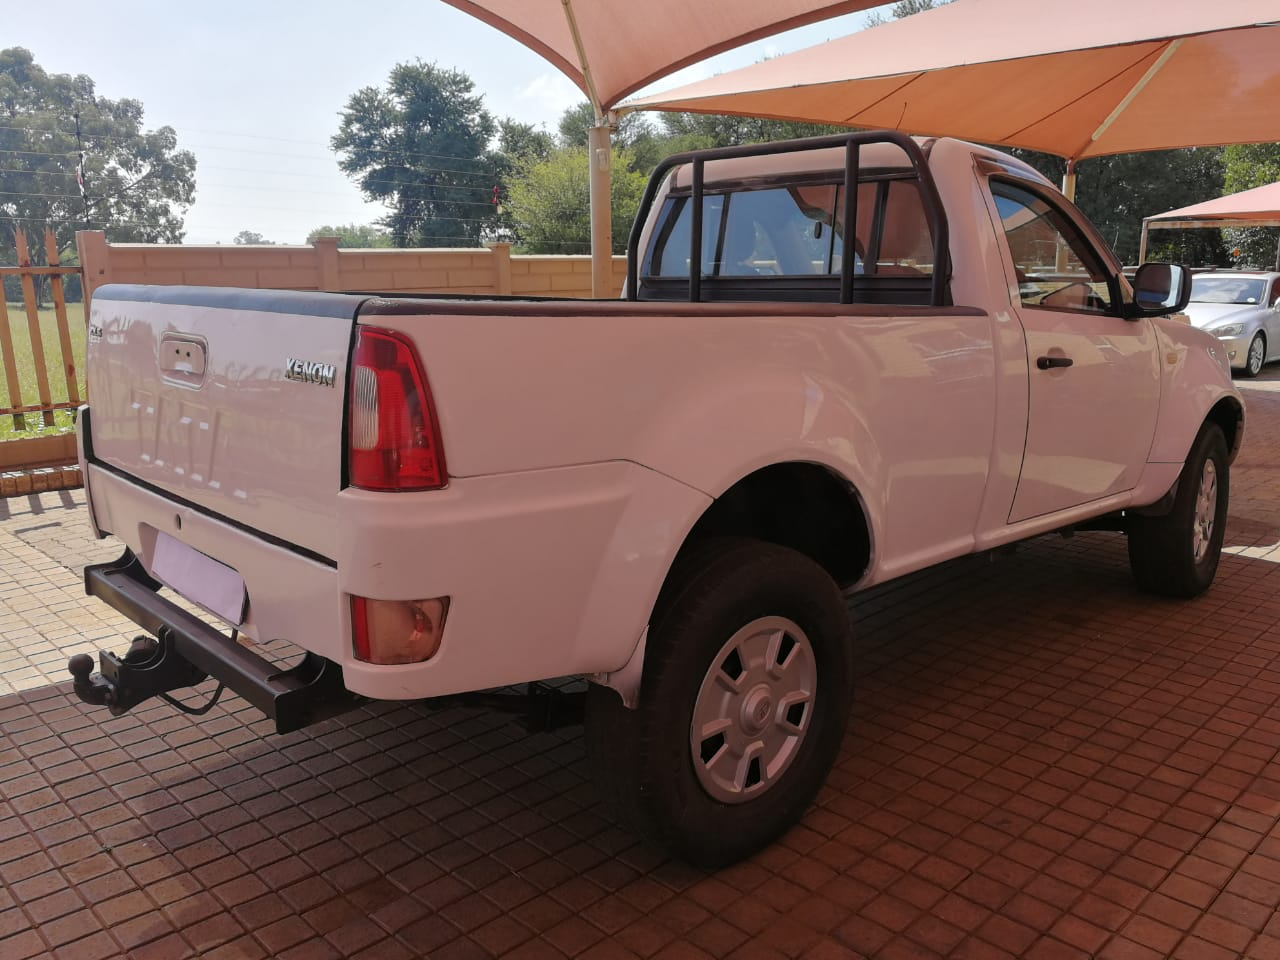 2010 Tata Xenon 2.2L DLE 4x4